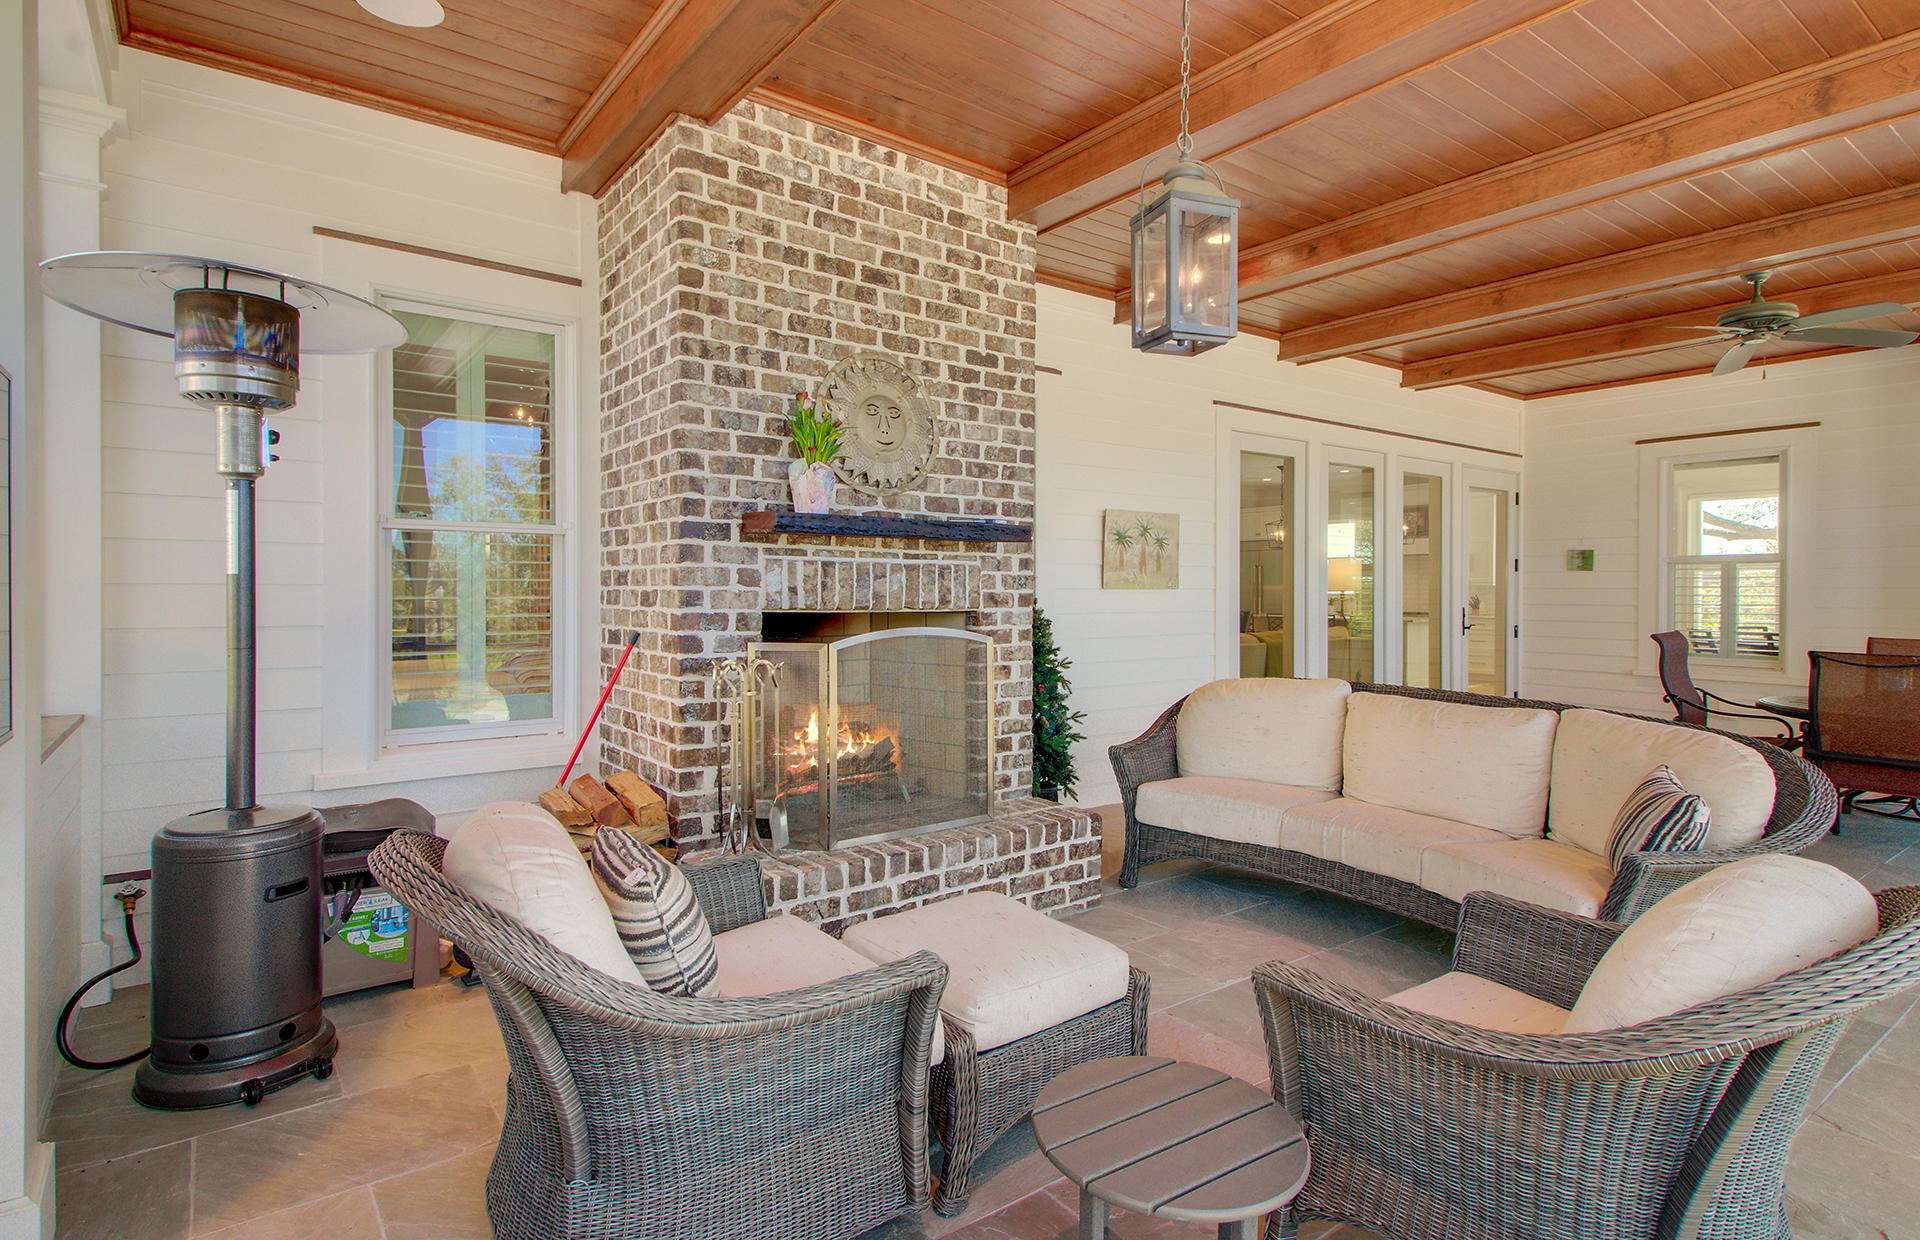 Beresford Hall Homes For Sale - 253 Grand Park, Charleston, SC - 0